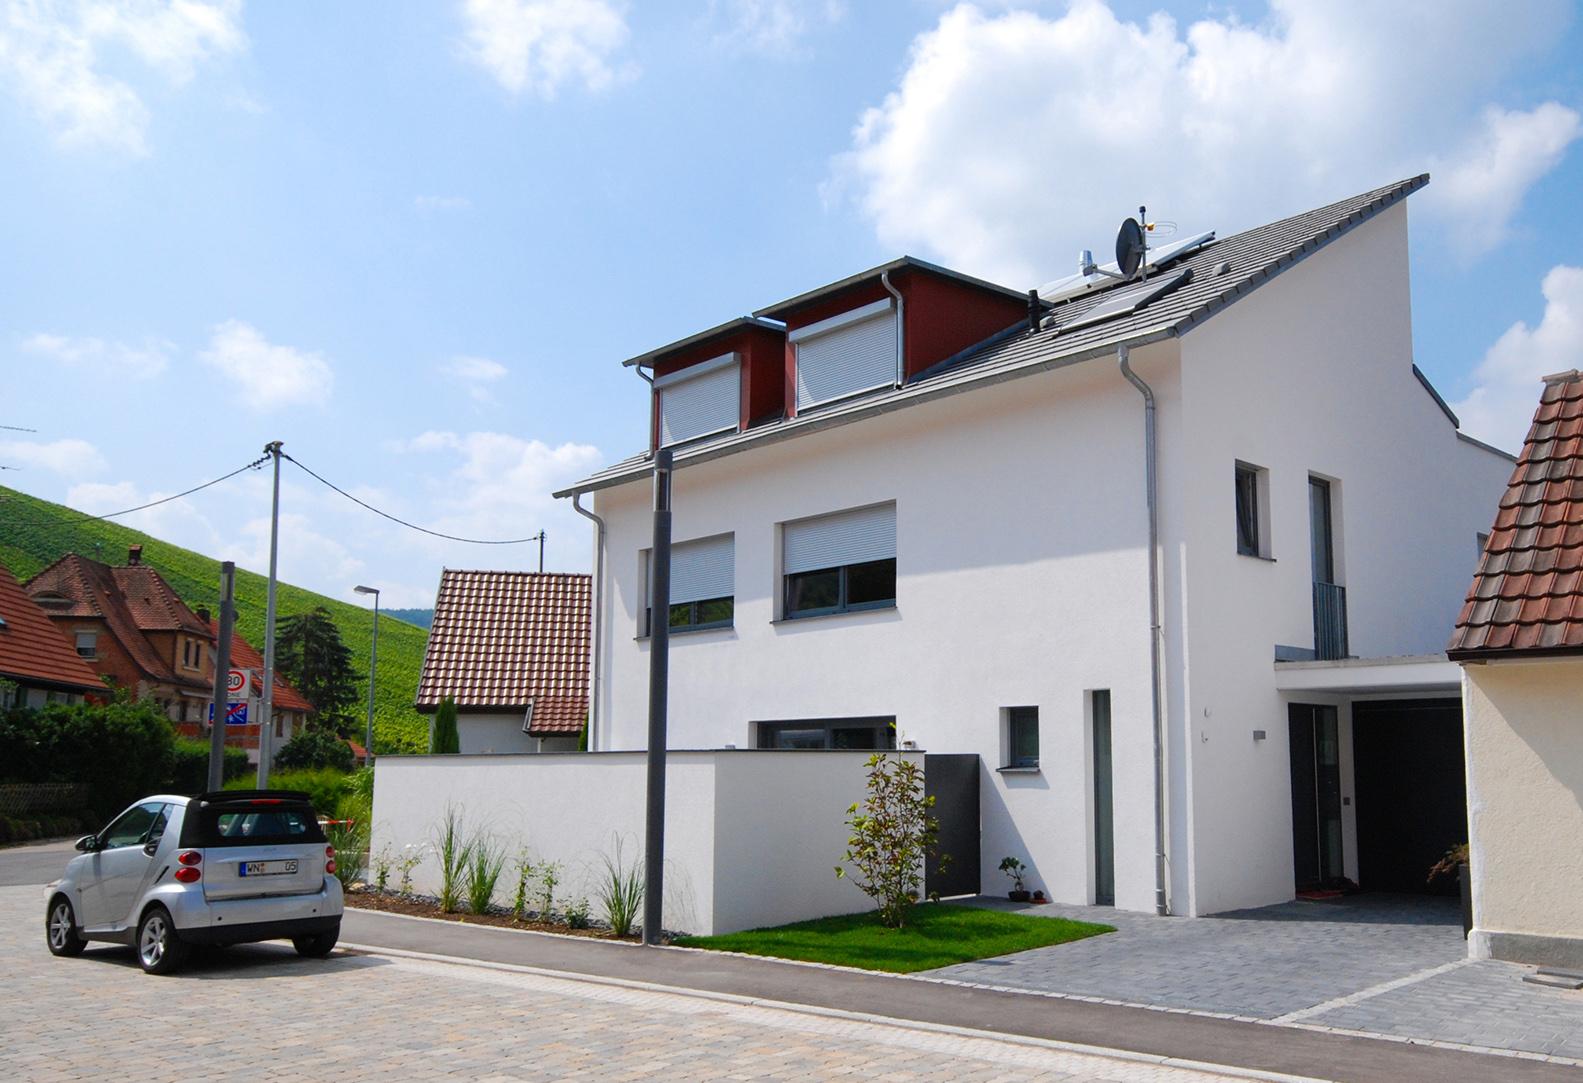 Einfamilienhäuser in Kernen